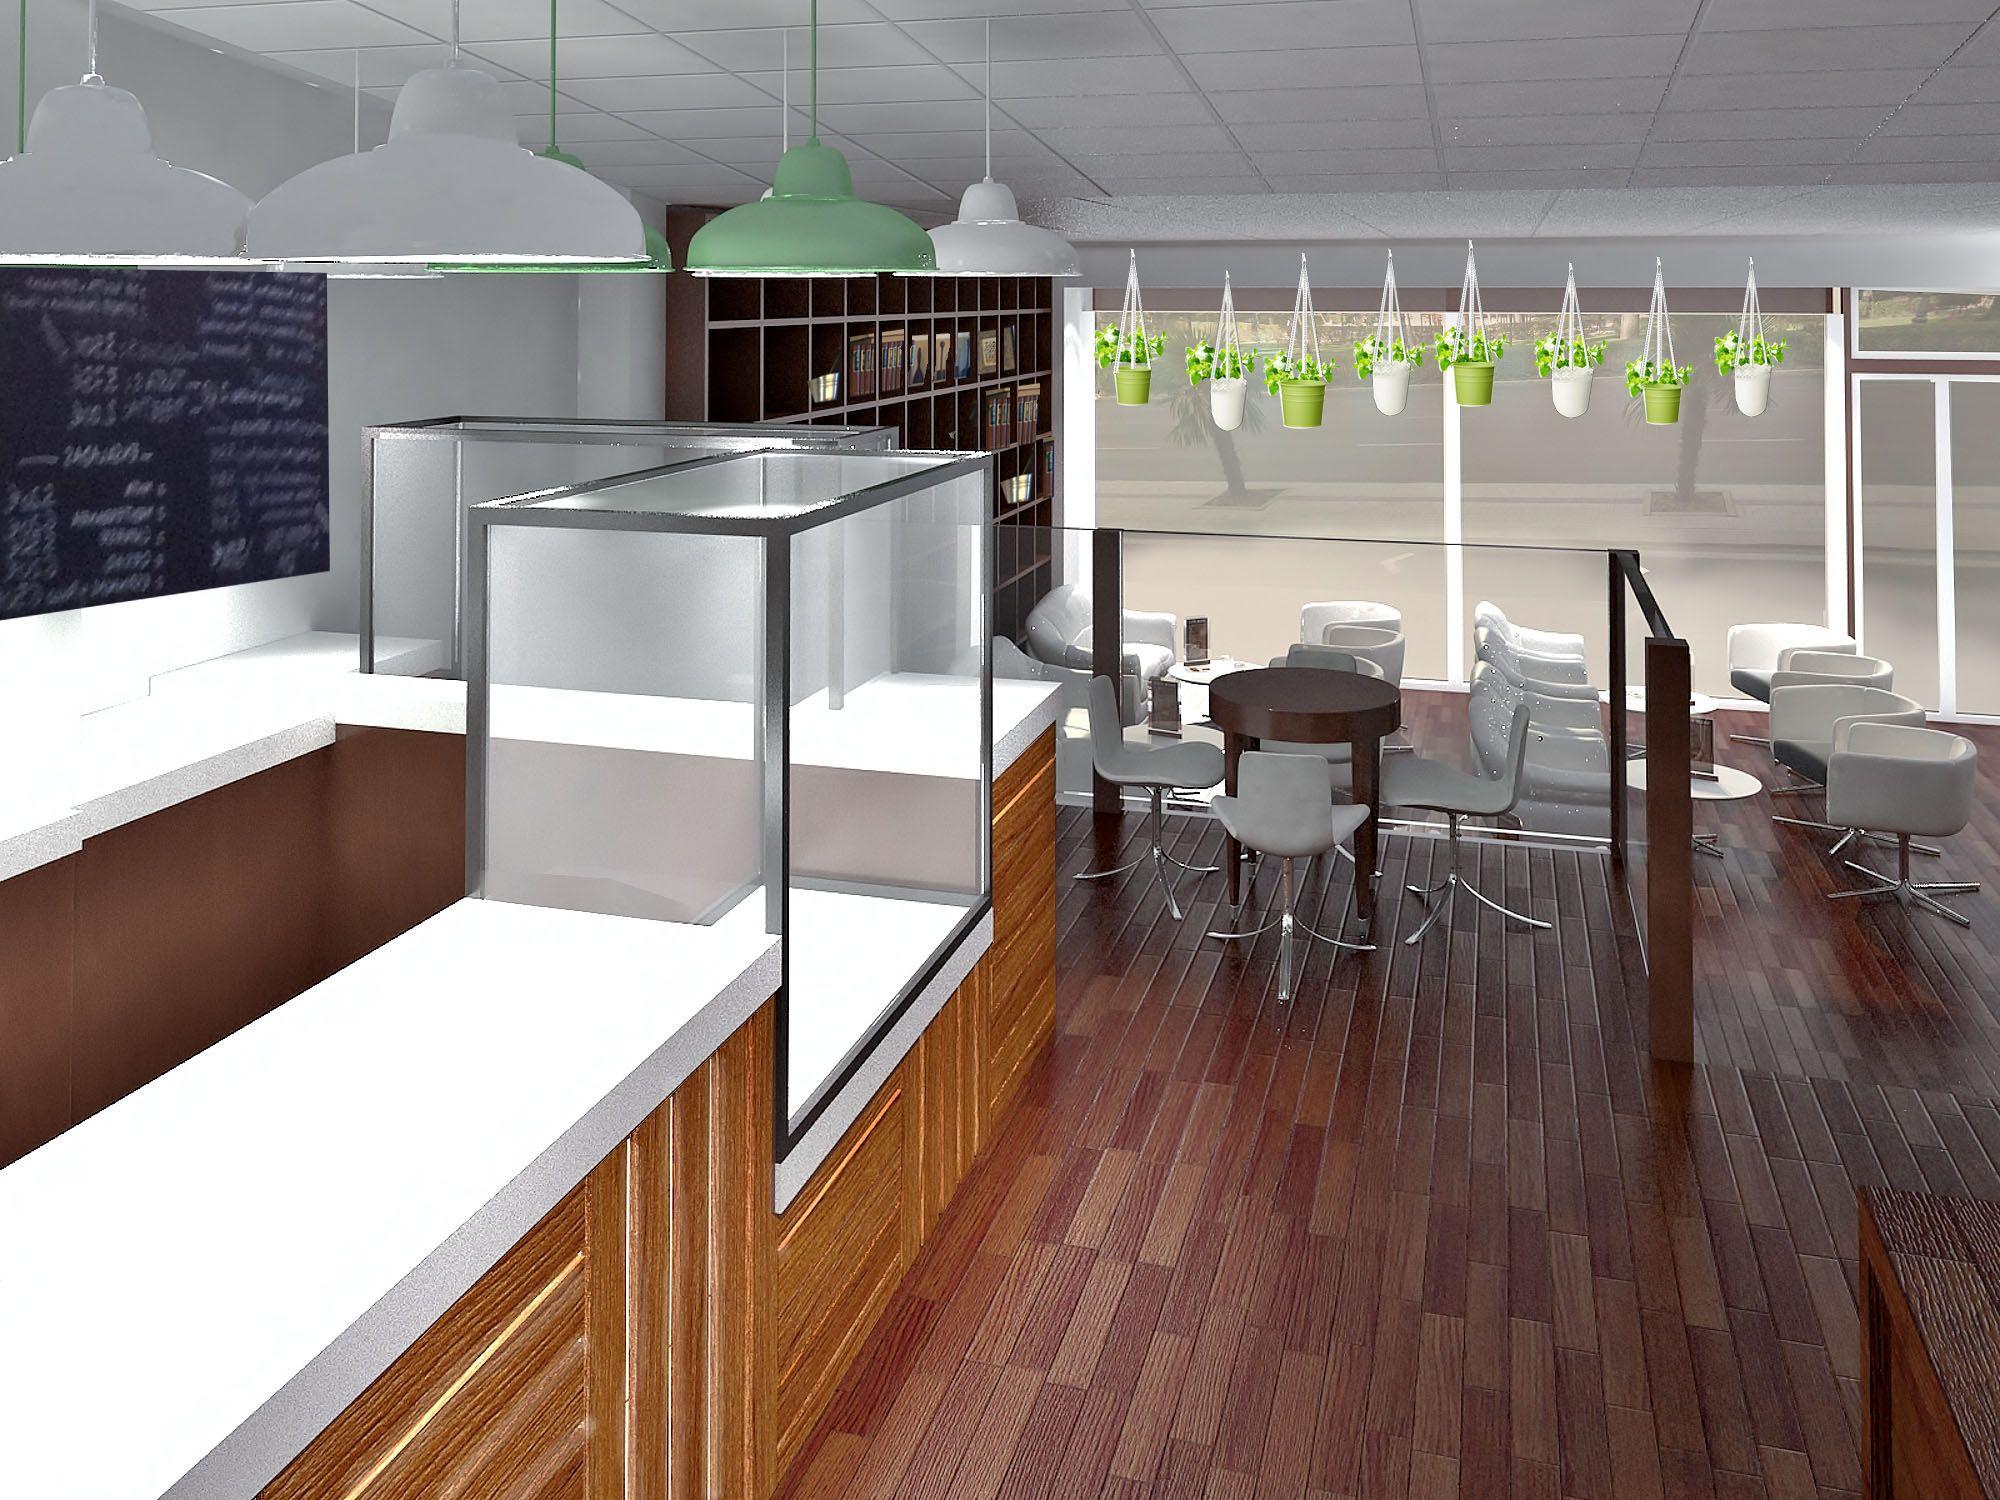 Ideas de cafeteria estilo contemporaneo color verde marron marron dise ado por aima - Diseno cafeterias modernas ...